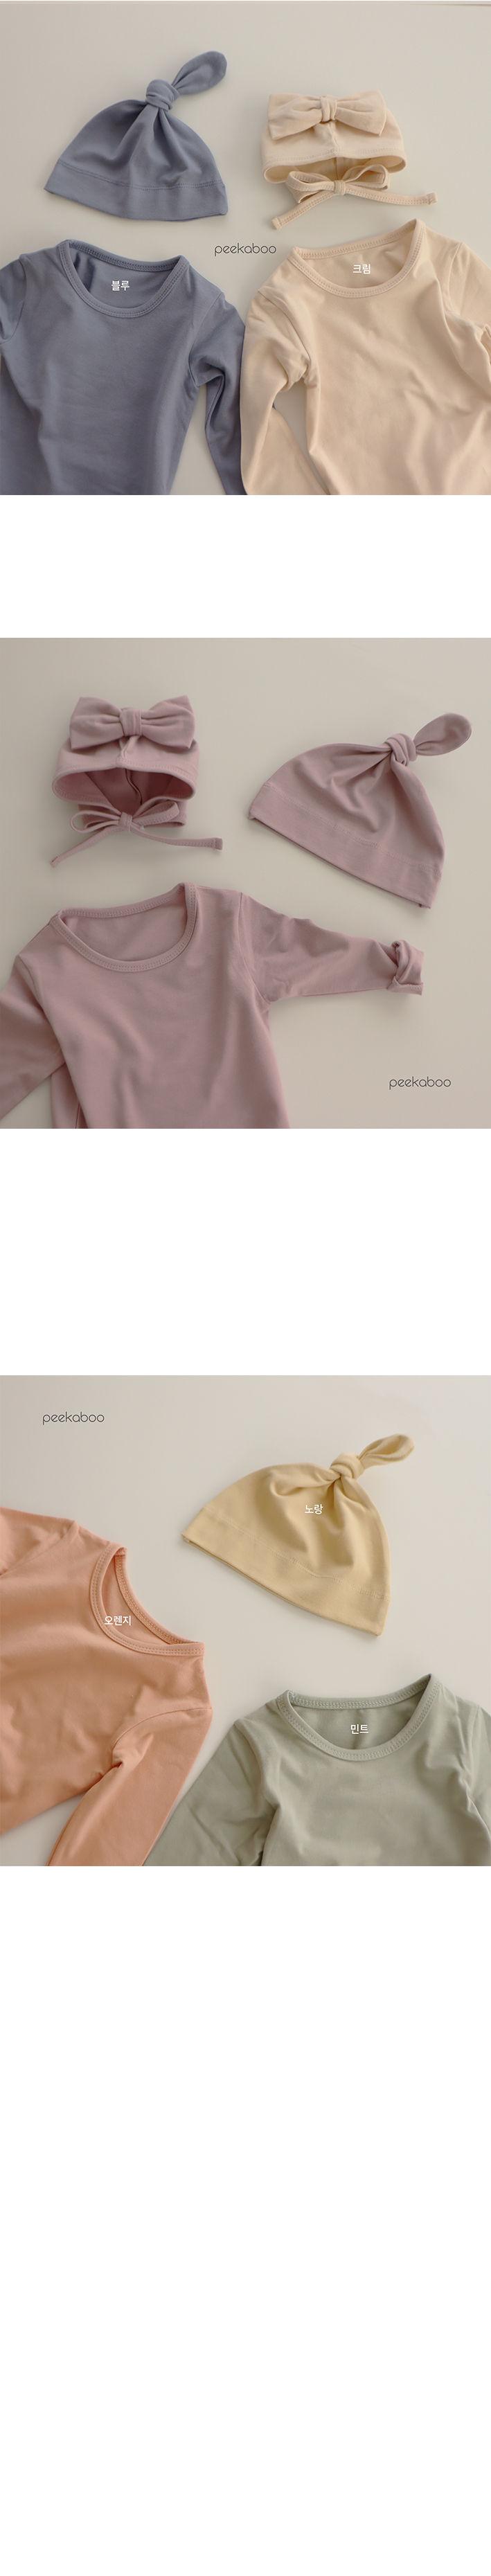 PEEKABOO - Korean Children Fashion - #Kfashion4kids - Modal Knot Hats - 3